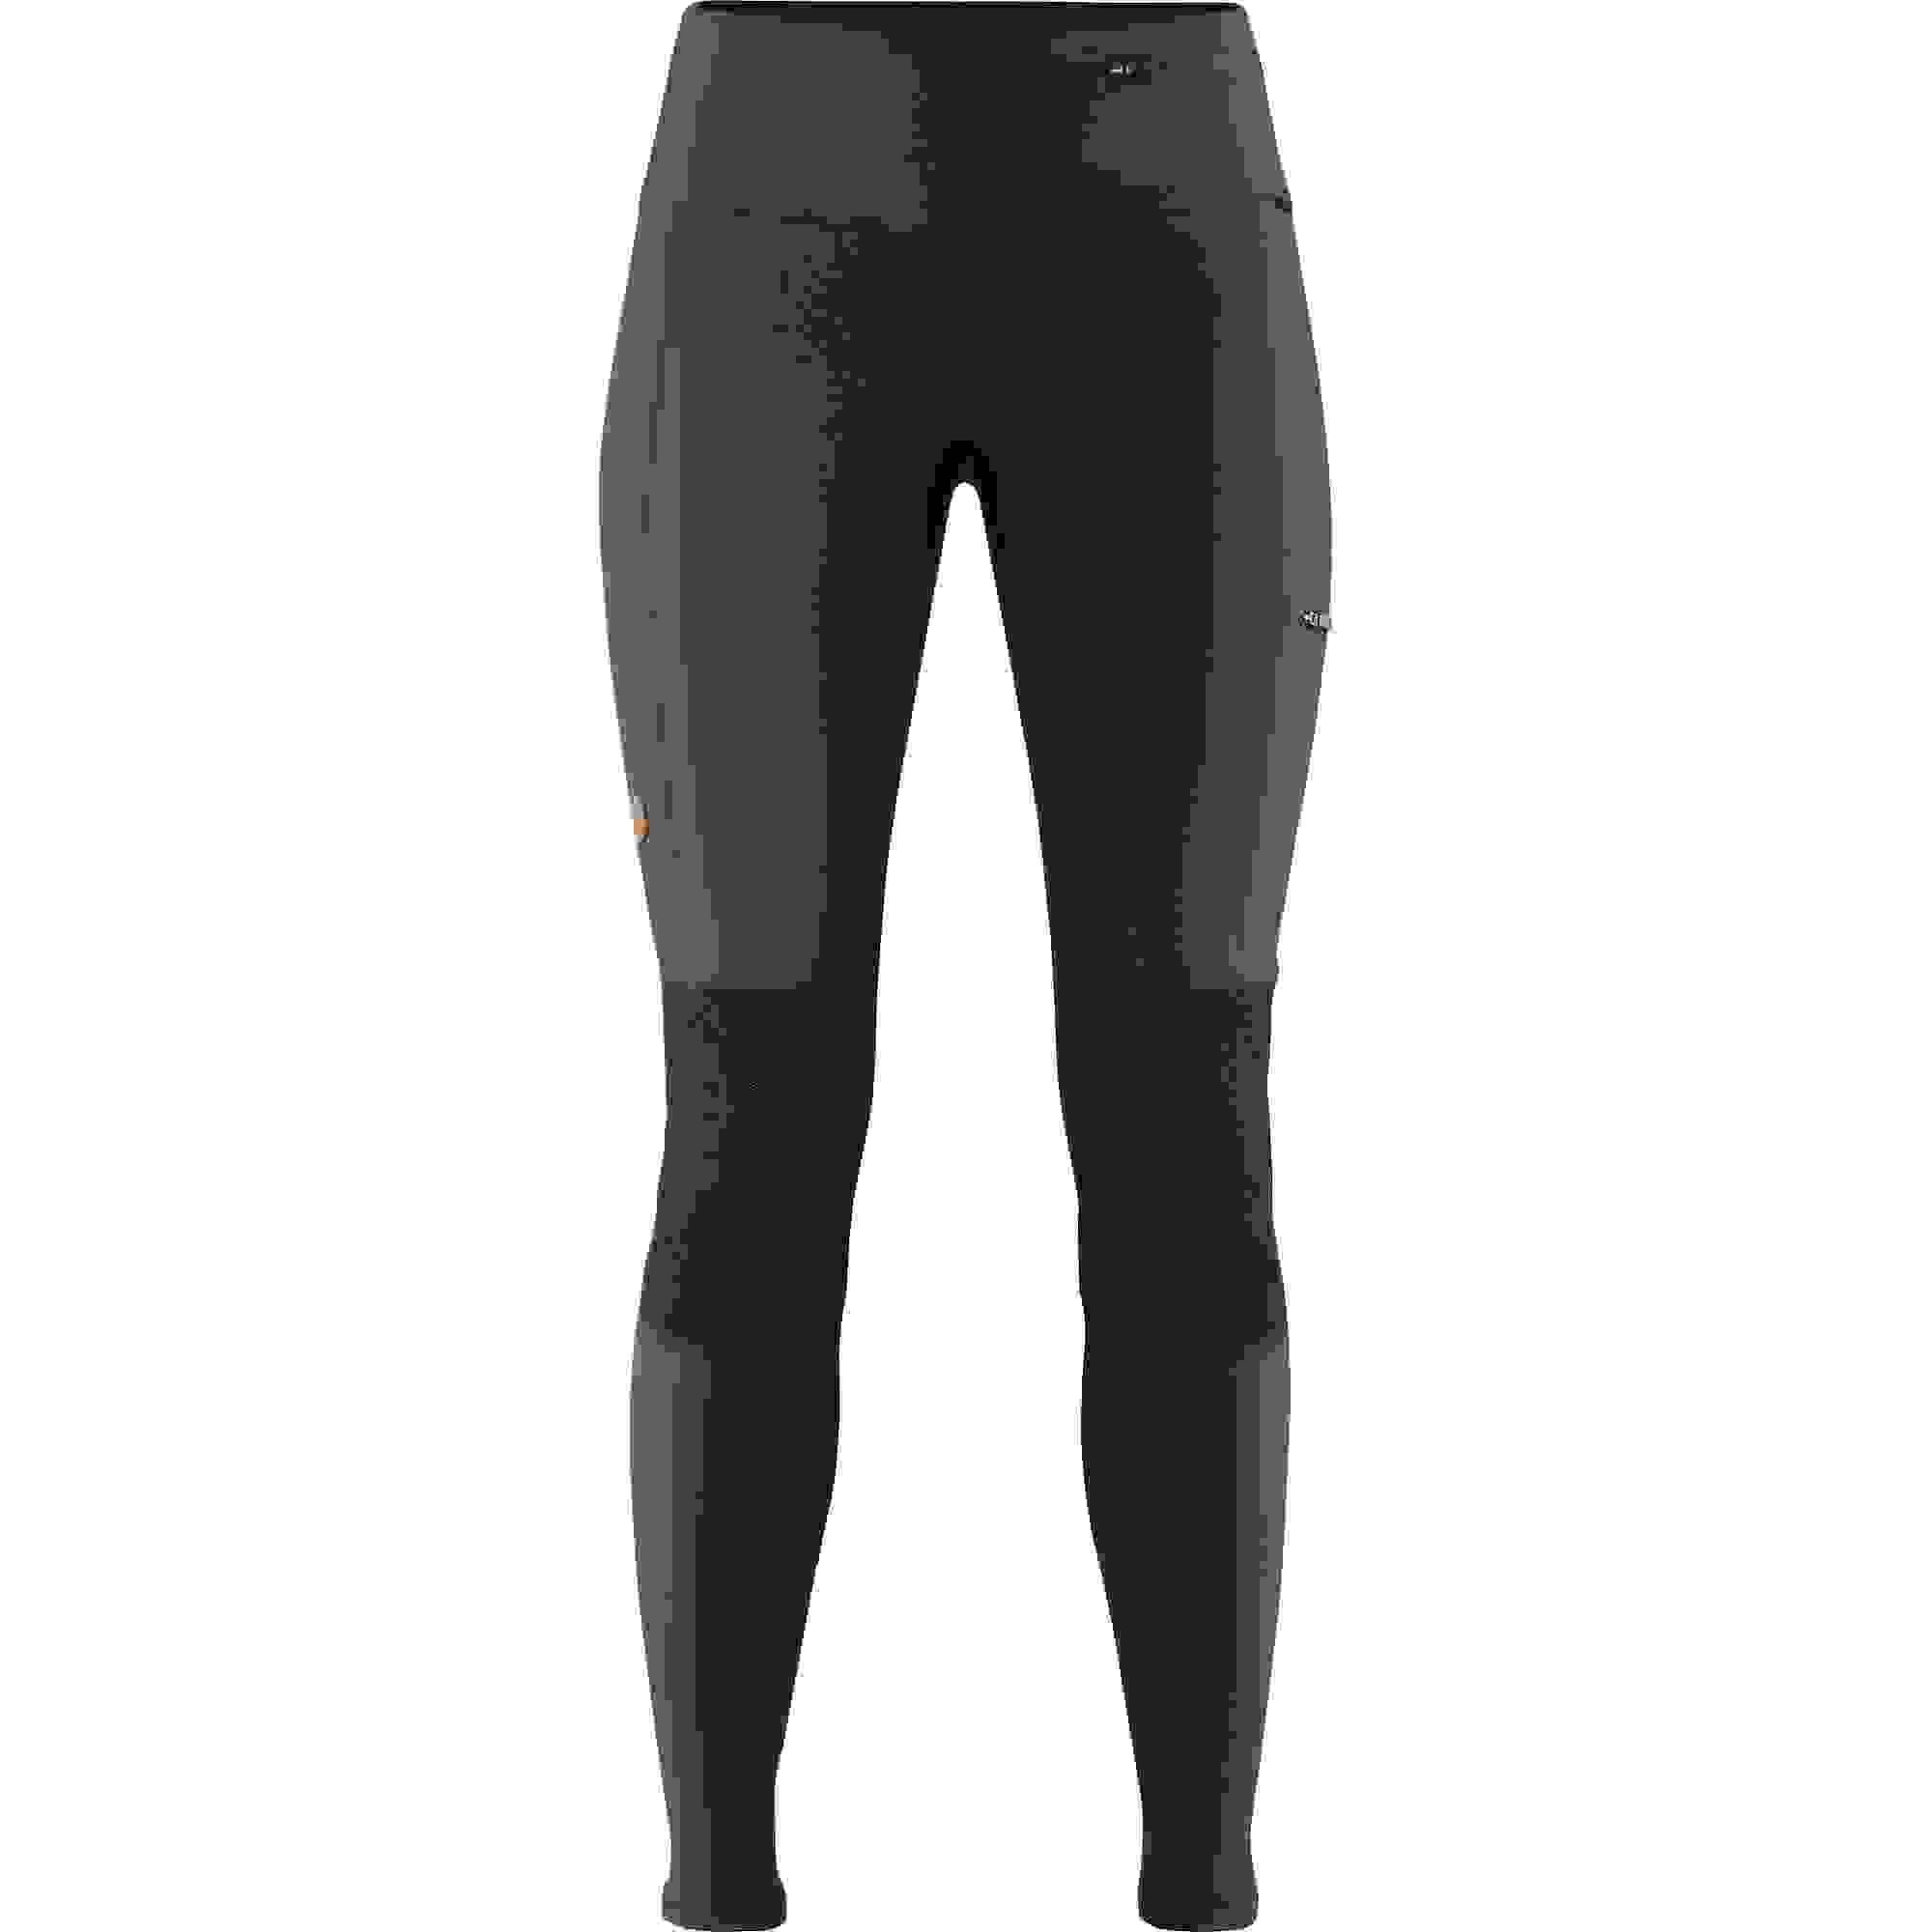 Dark Grey All Sizes Fjallraven Abisko Trekking Tights Womens Pants Walking